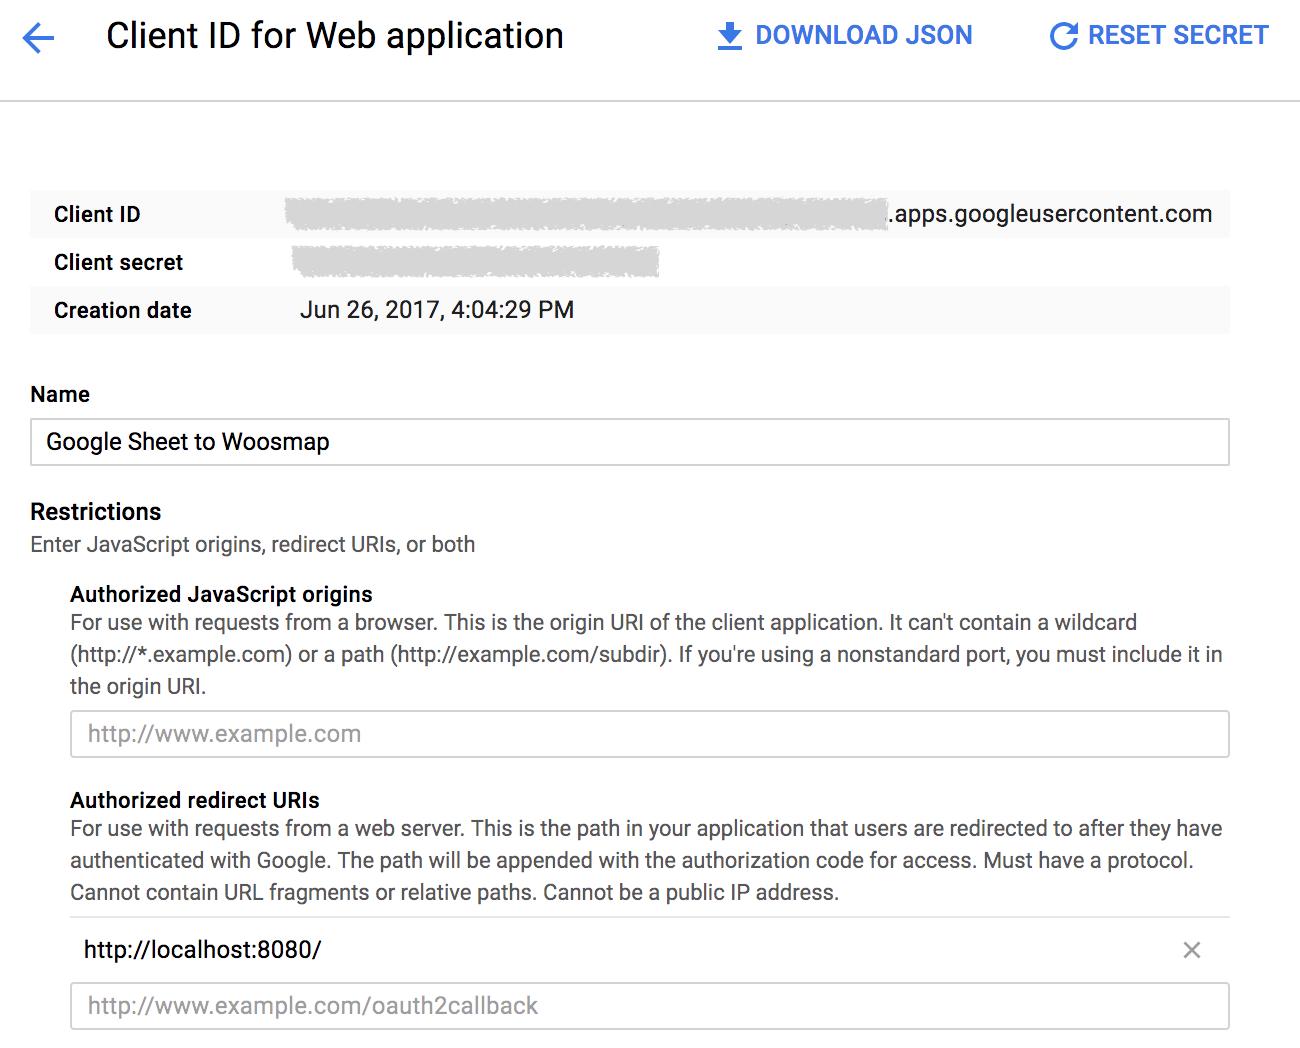 Google Redirect URI